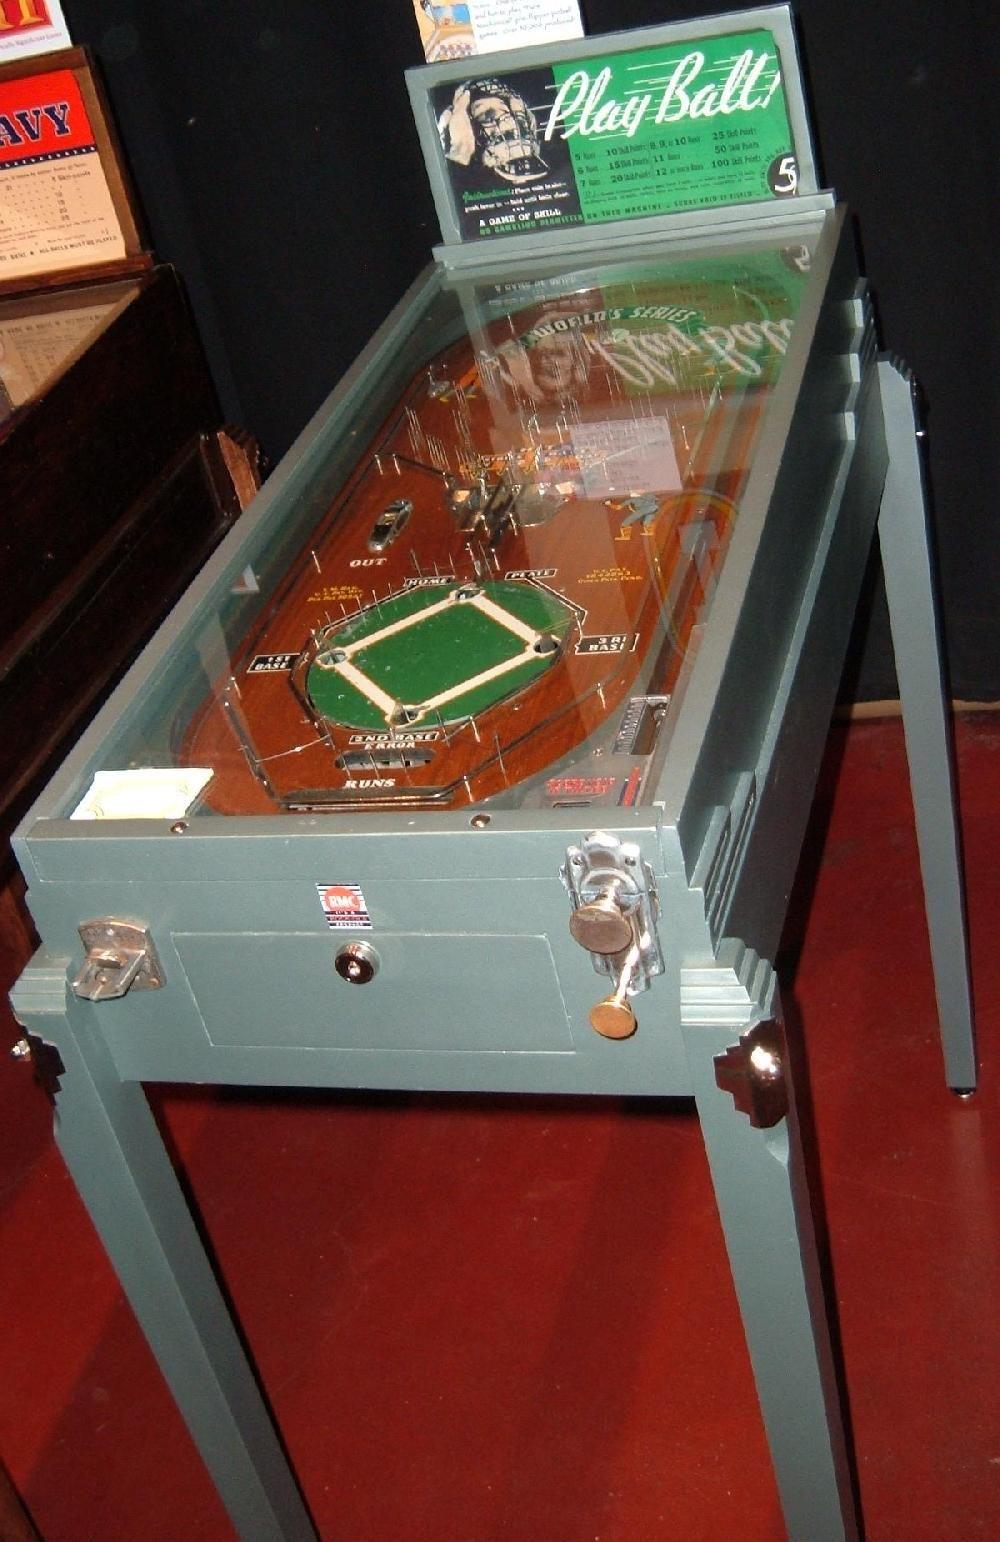 1934 Rockola World Series 1934 Play Ball Baseball Pinball Machine